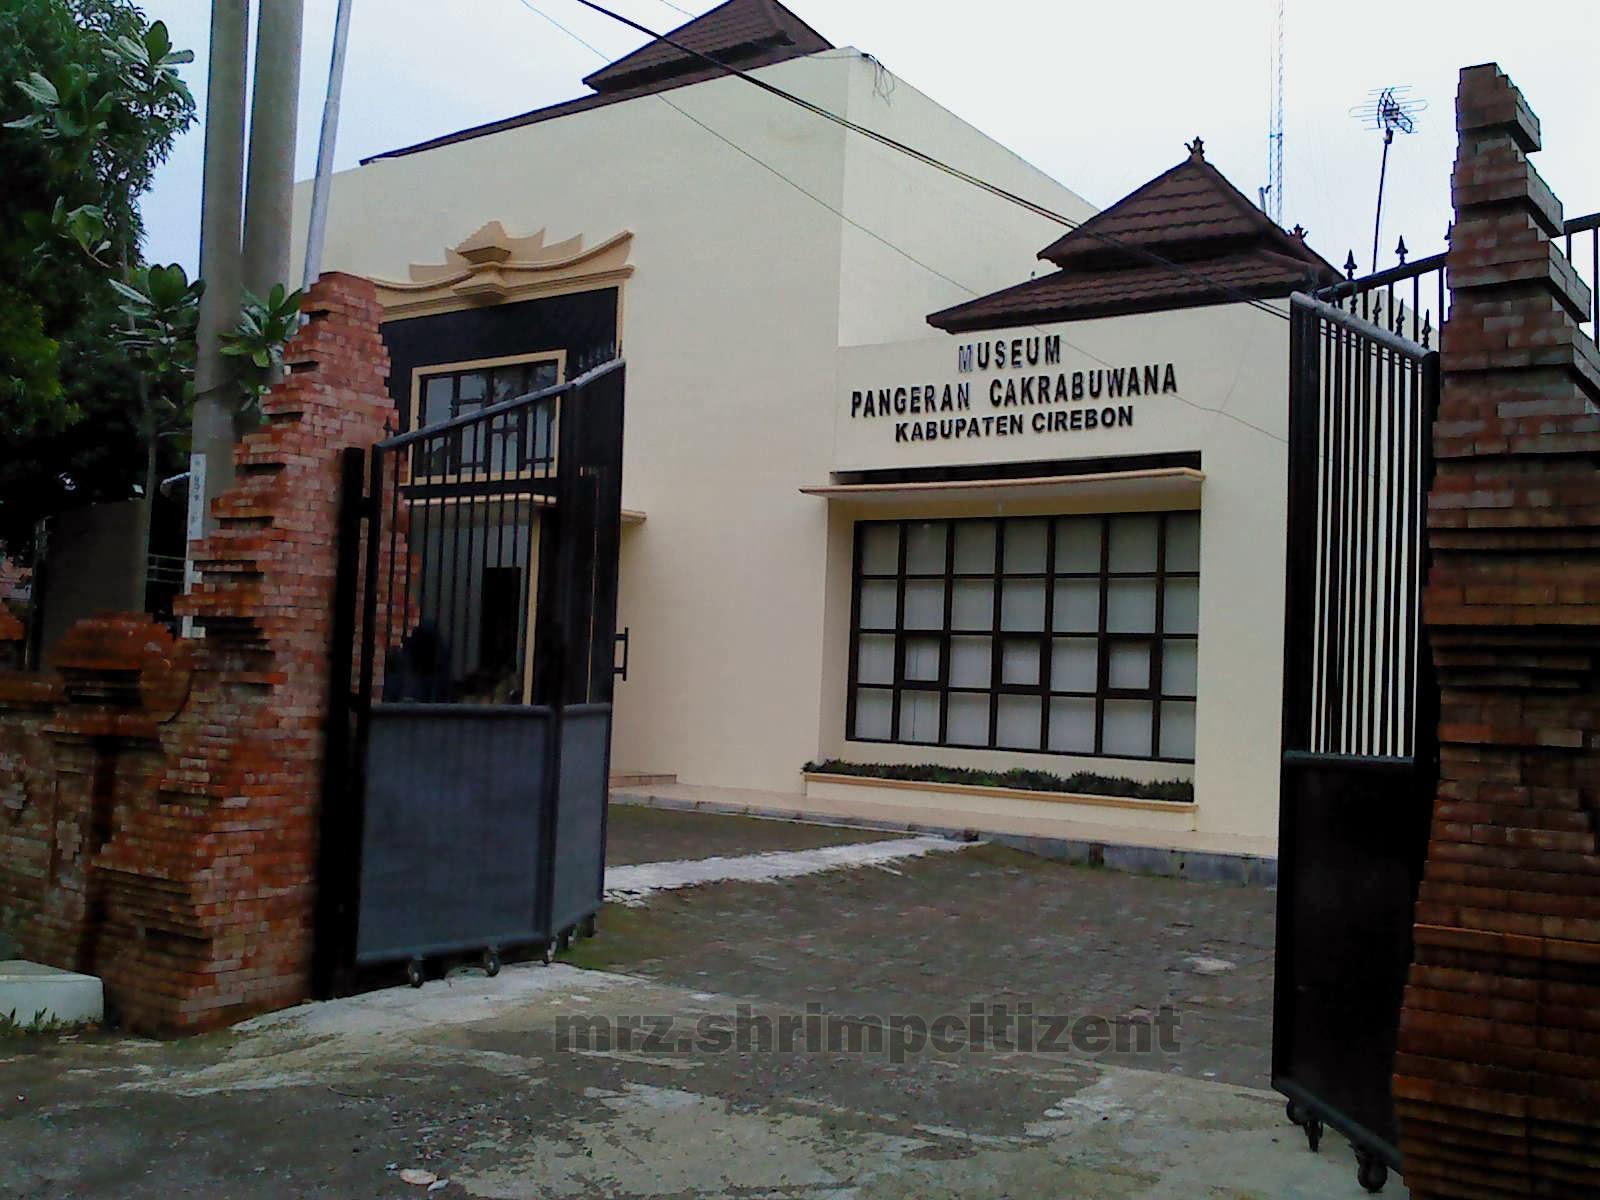 Musem Pangeran Cakrabuana Kabupaten Cirebon 1